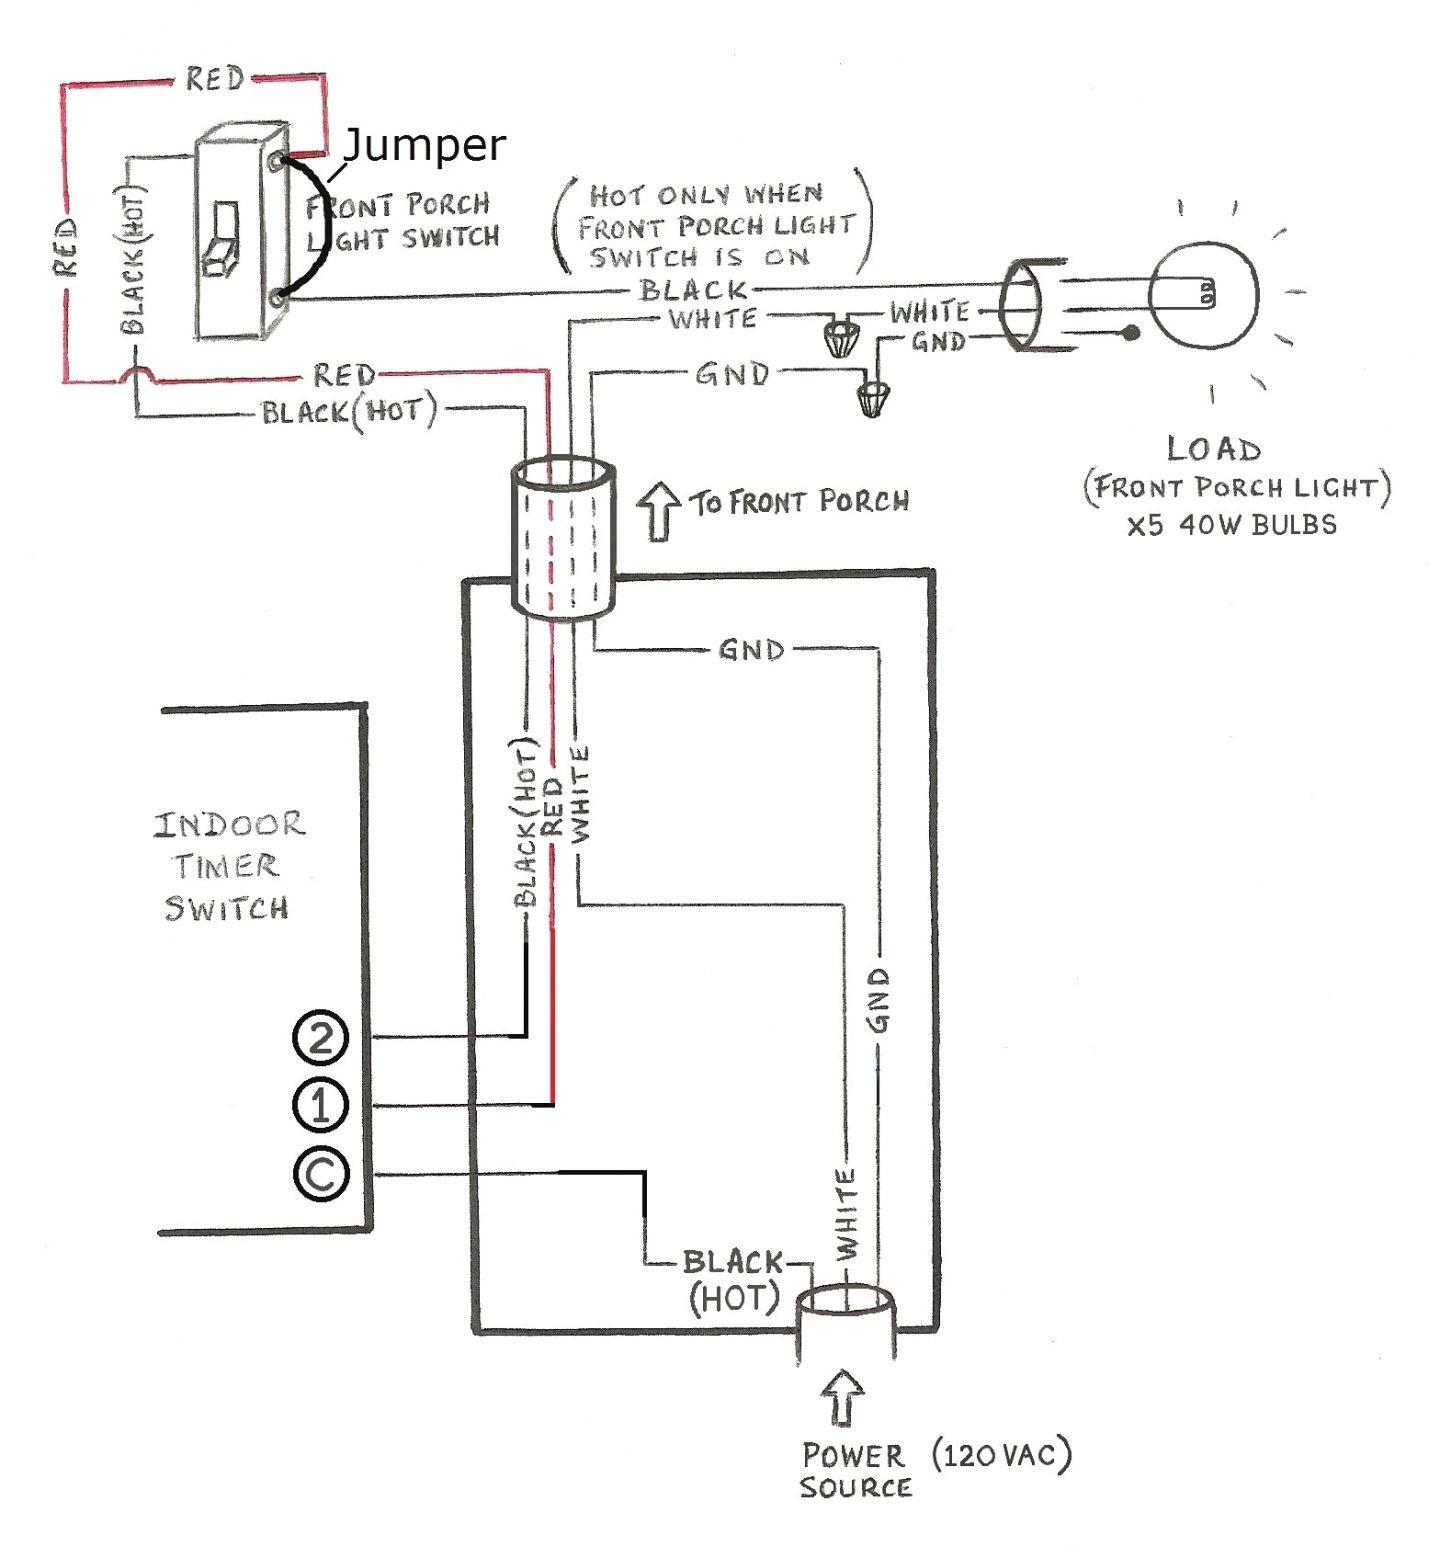 Honeywell Aquastat Relay L8148E Wiring Diagram And In Tearing For - Honeywell Aquastat L8148E Wiring Diagram